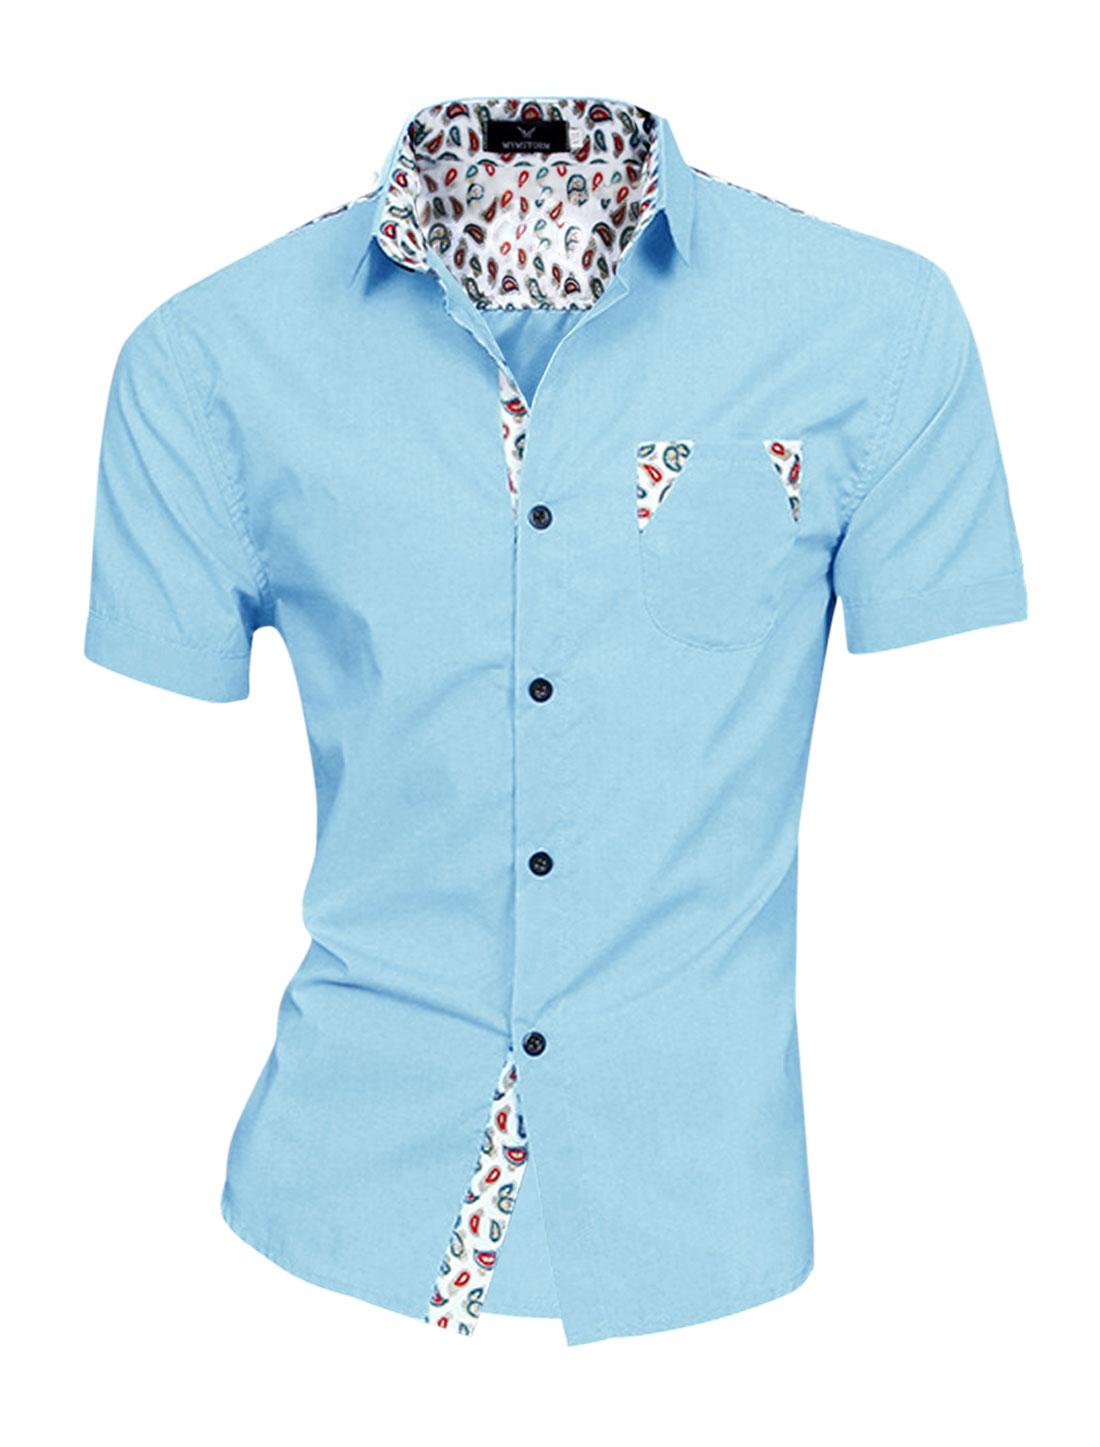 Men Paisleys Pattern Patching Fashion Top Shirt Light Blue M